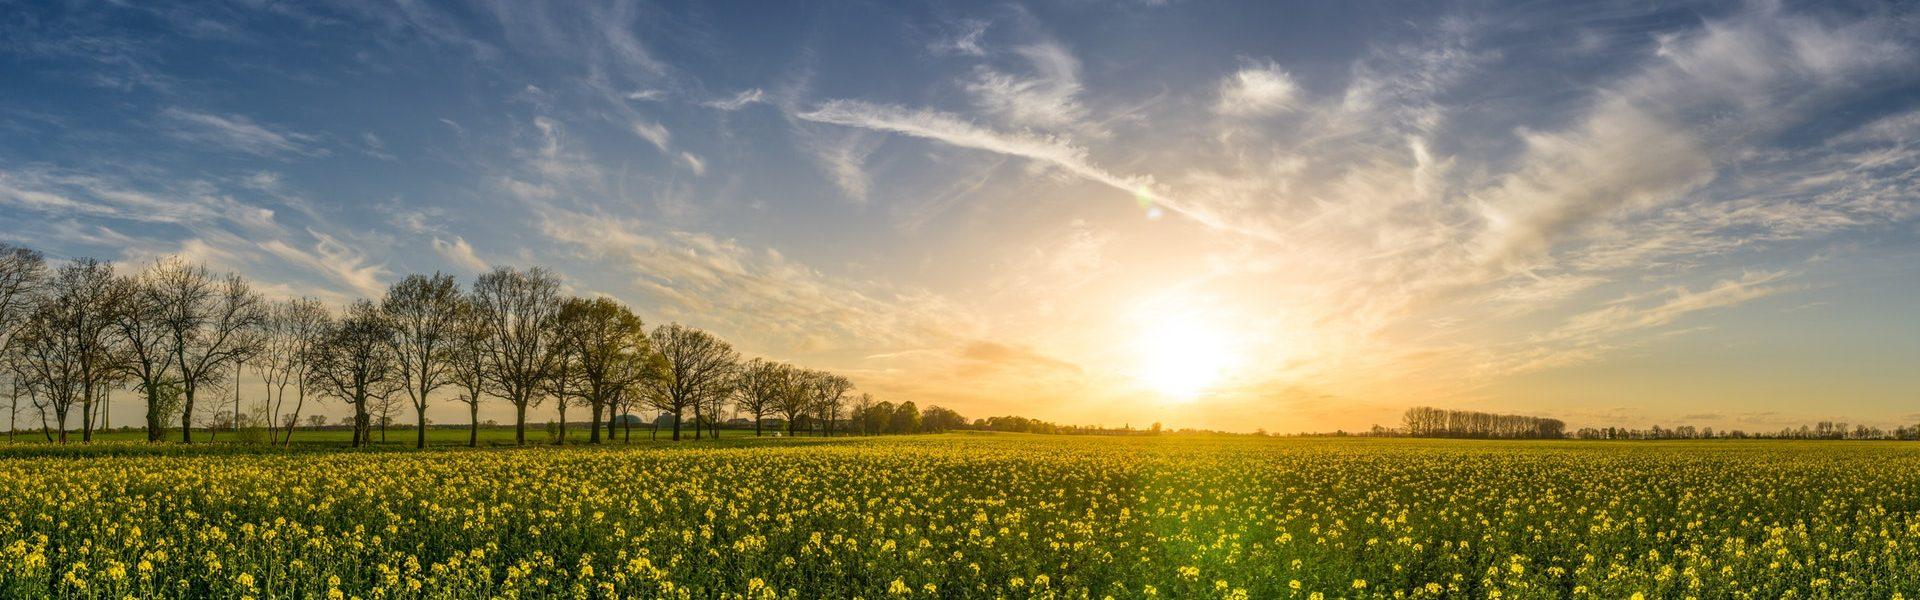 Audiolibri di primavera